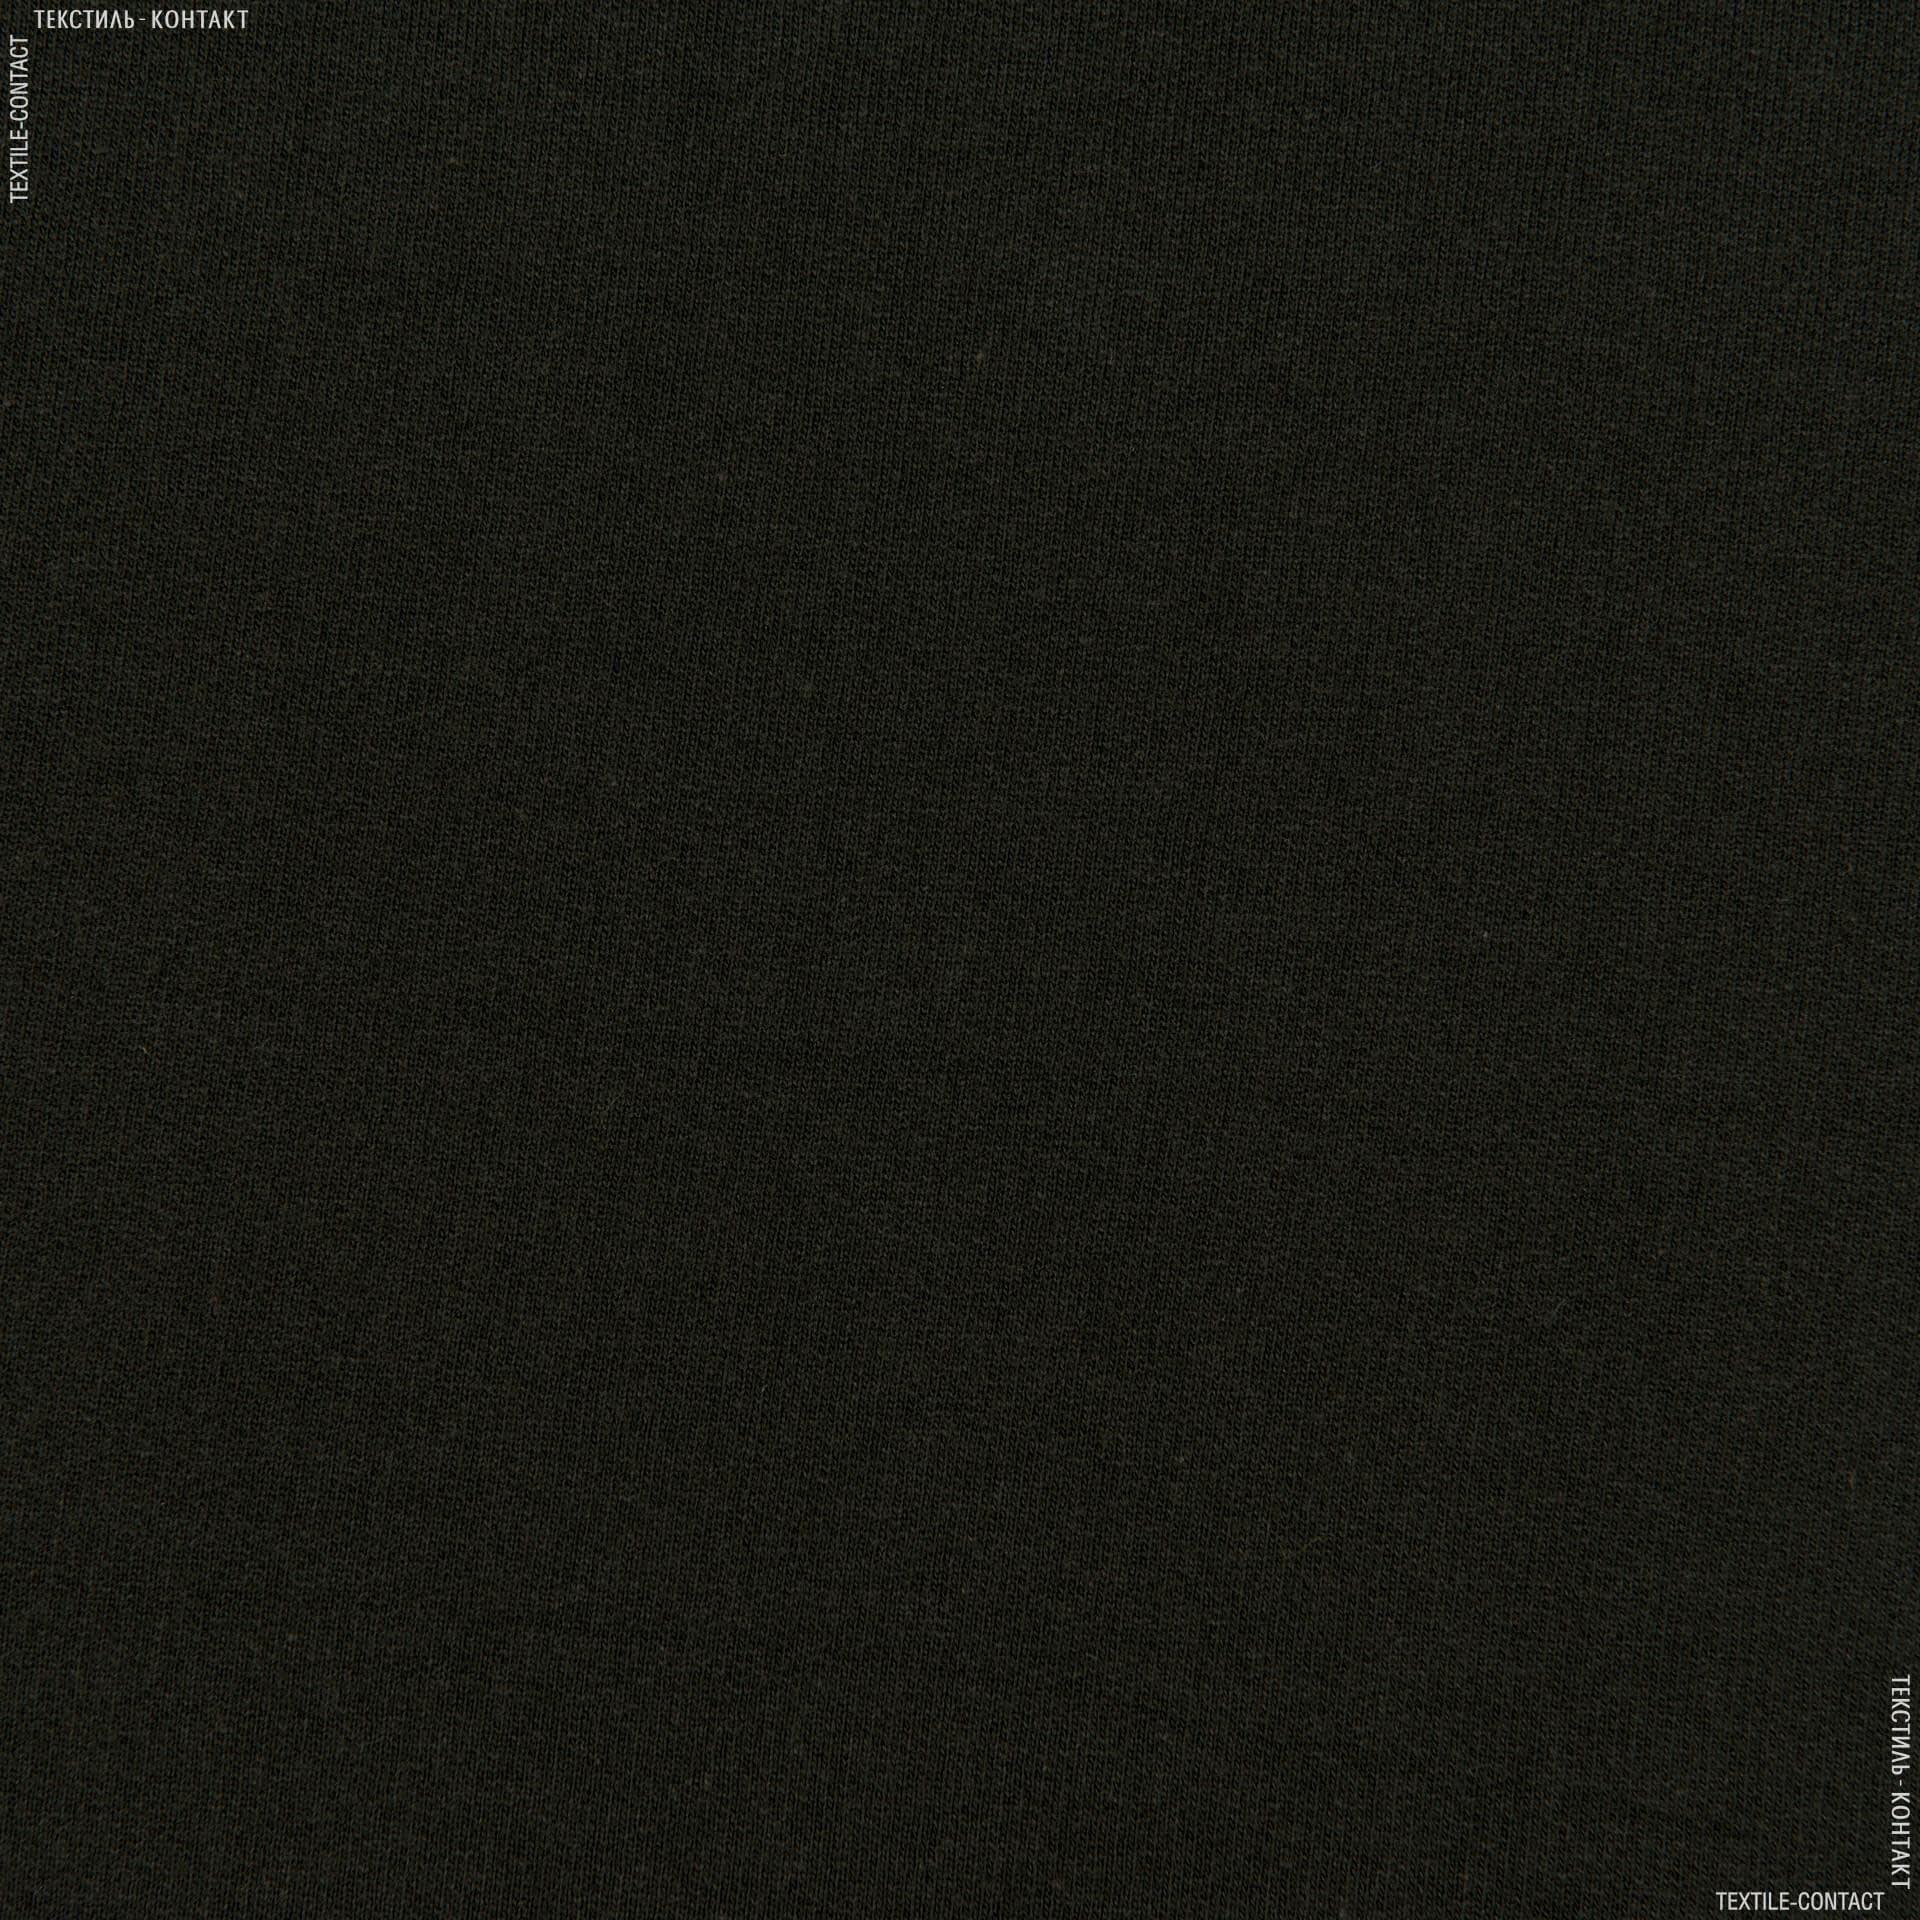 Ткани трикотаж - Футер трехнитка черный